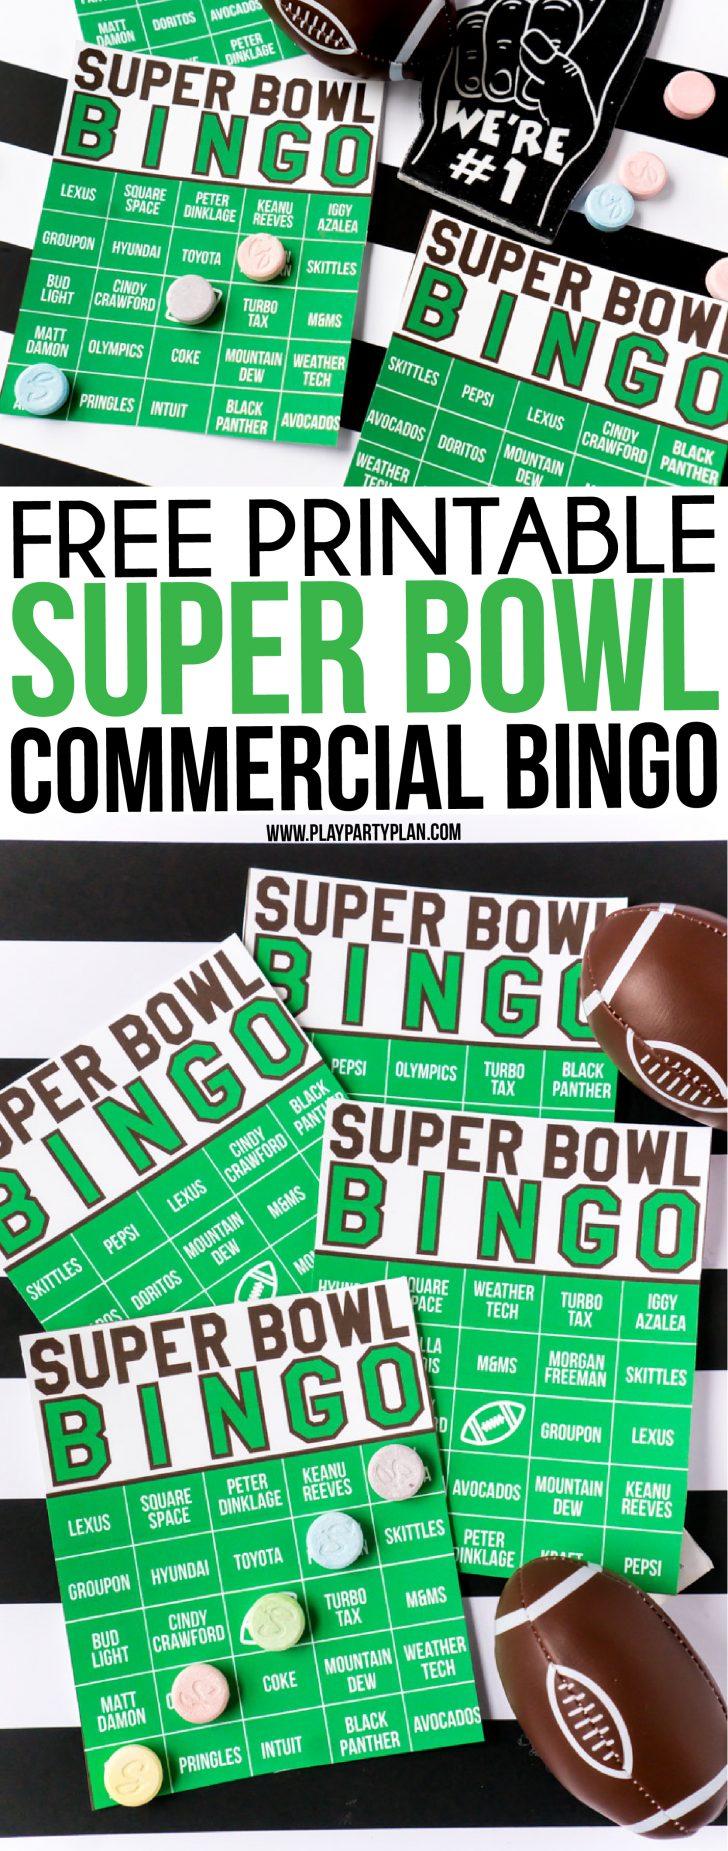 Free Printable Super Bowl Bingo Cards 2019